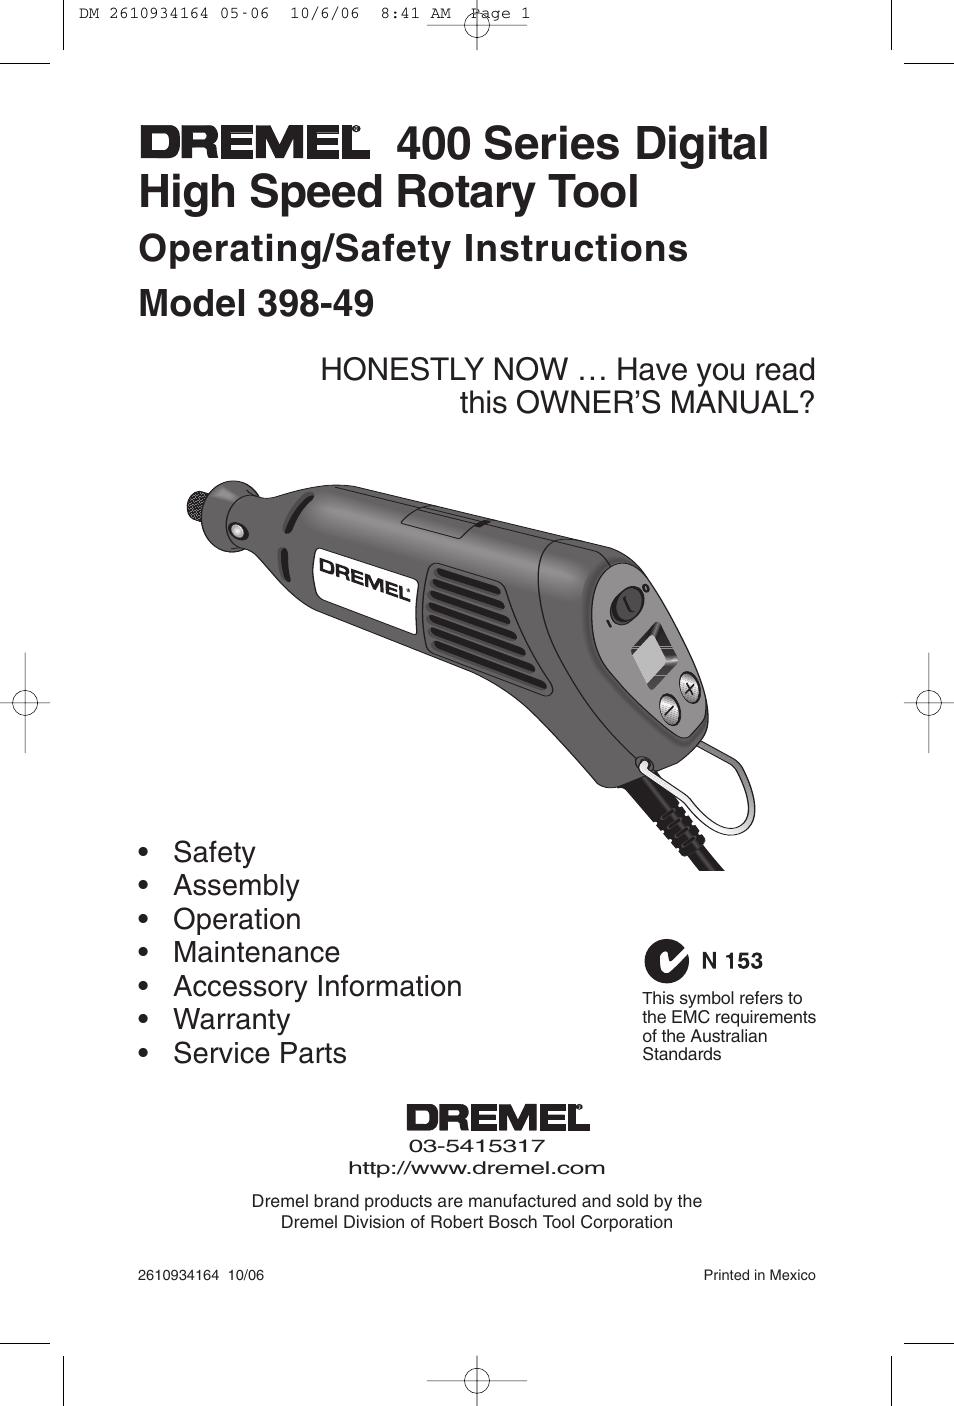 dremel 400 series digital 398 49 user manual 24 pages rh manualsdir com Dremel Multi Tool Dremel 395 Type 5 Manual